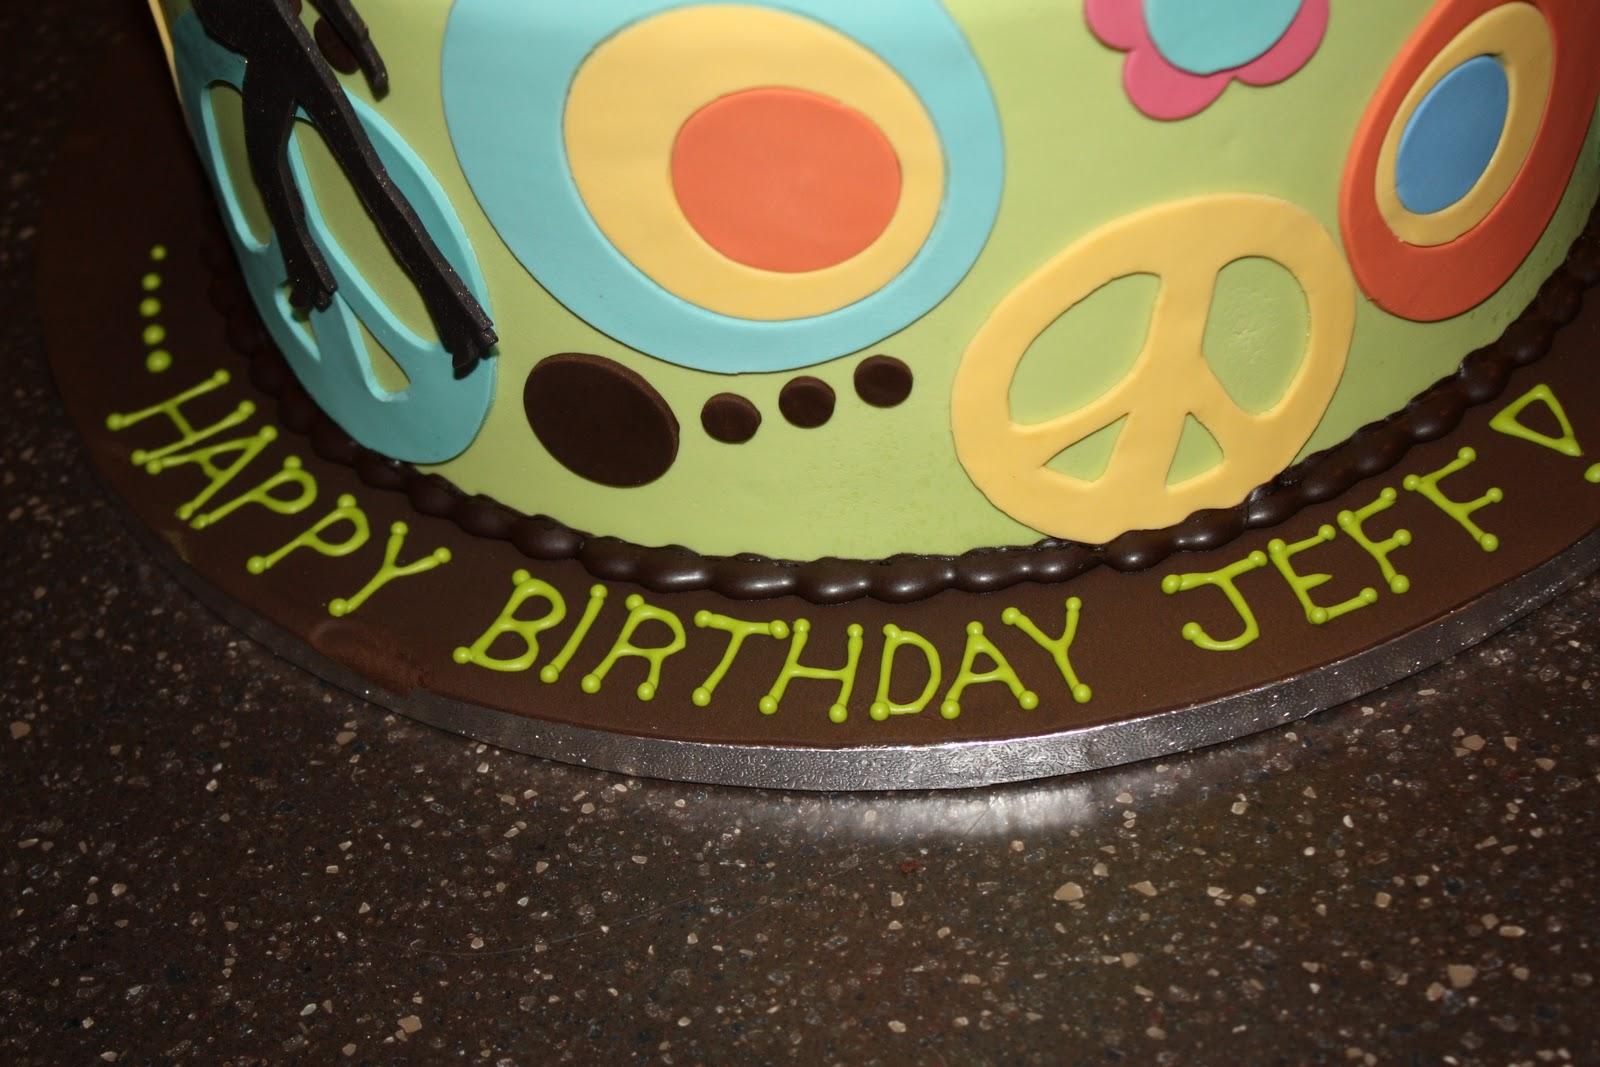 The Good Apple Jeffs 40th Birthday Cake